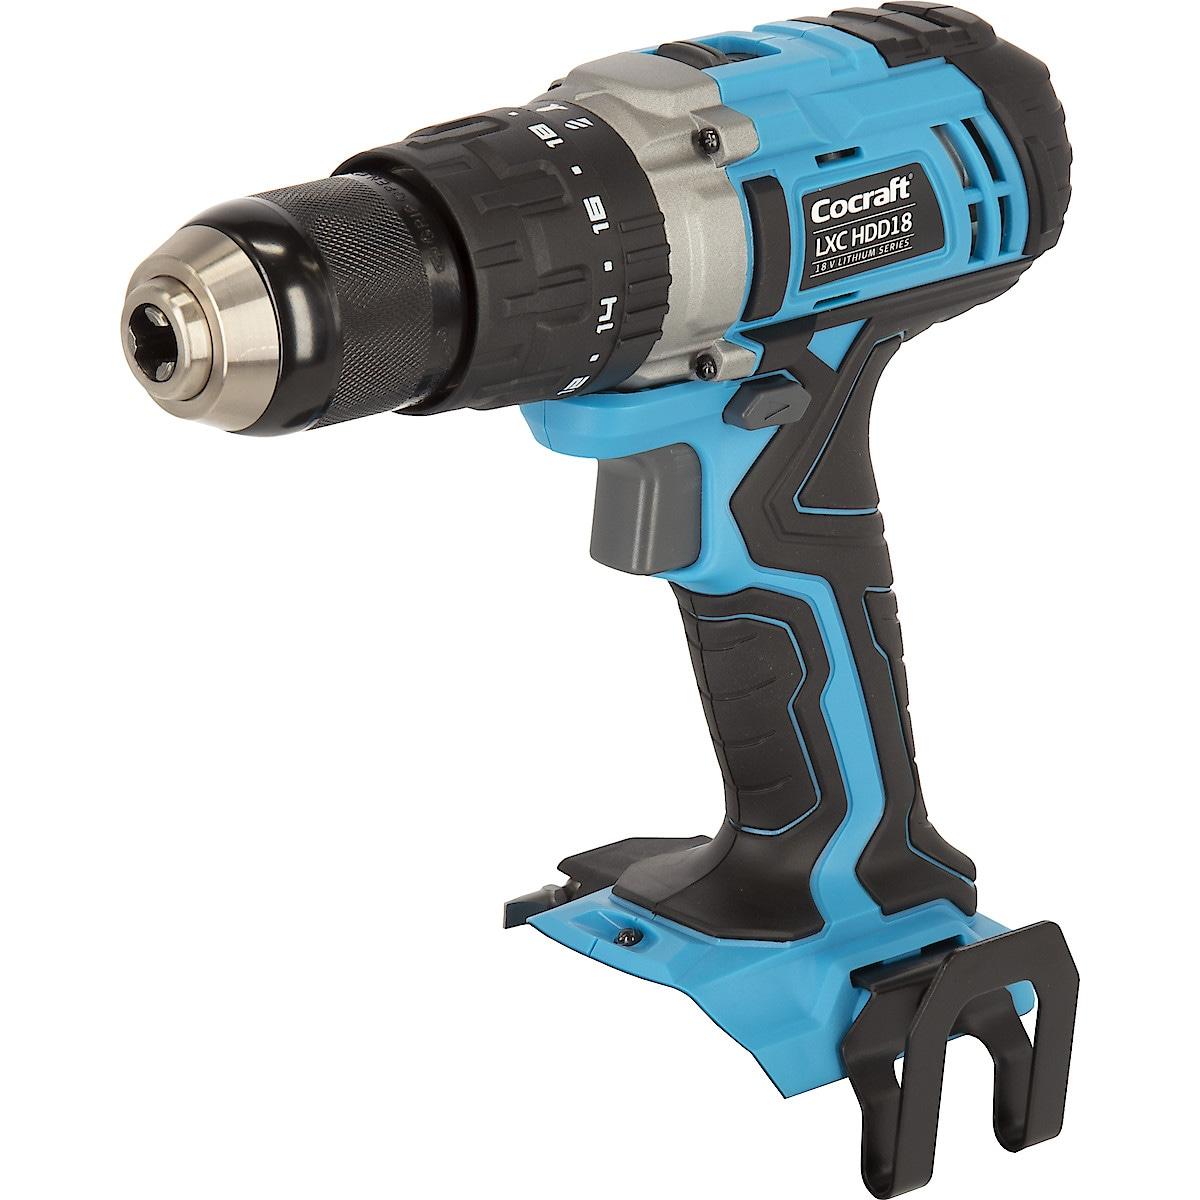 Cocraft LXC HDD18 drill